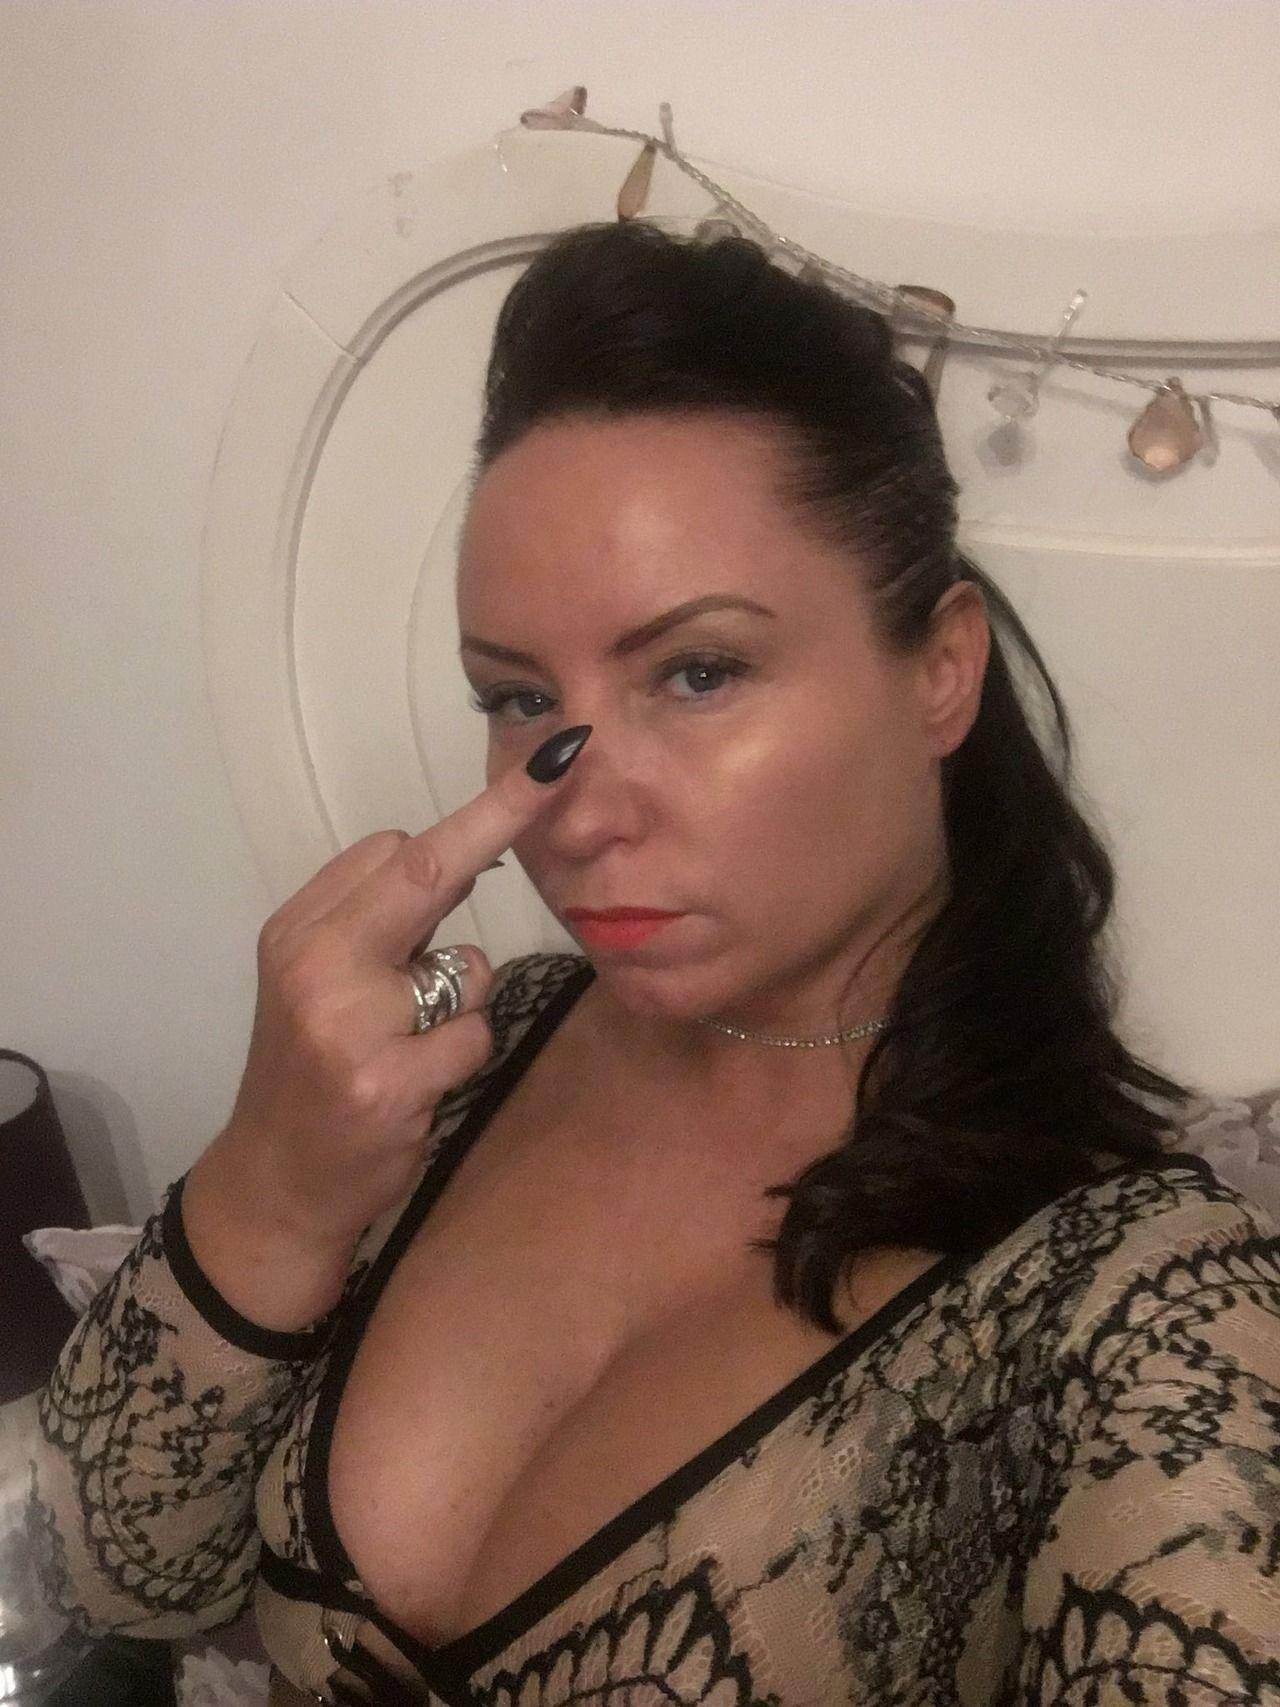 Fort wayne massage reviews abuse